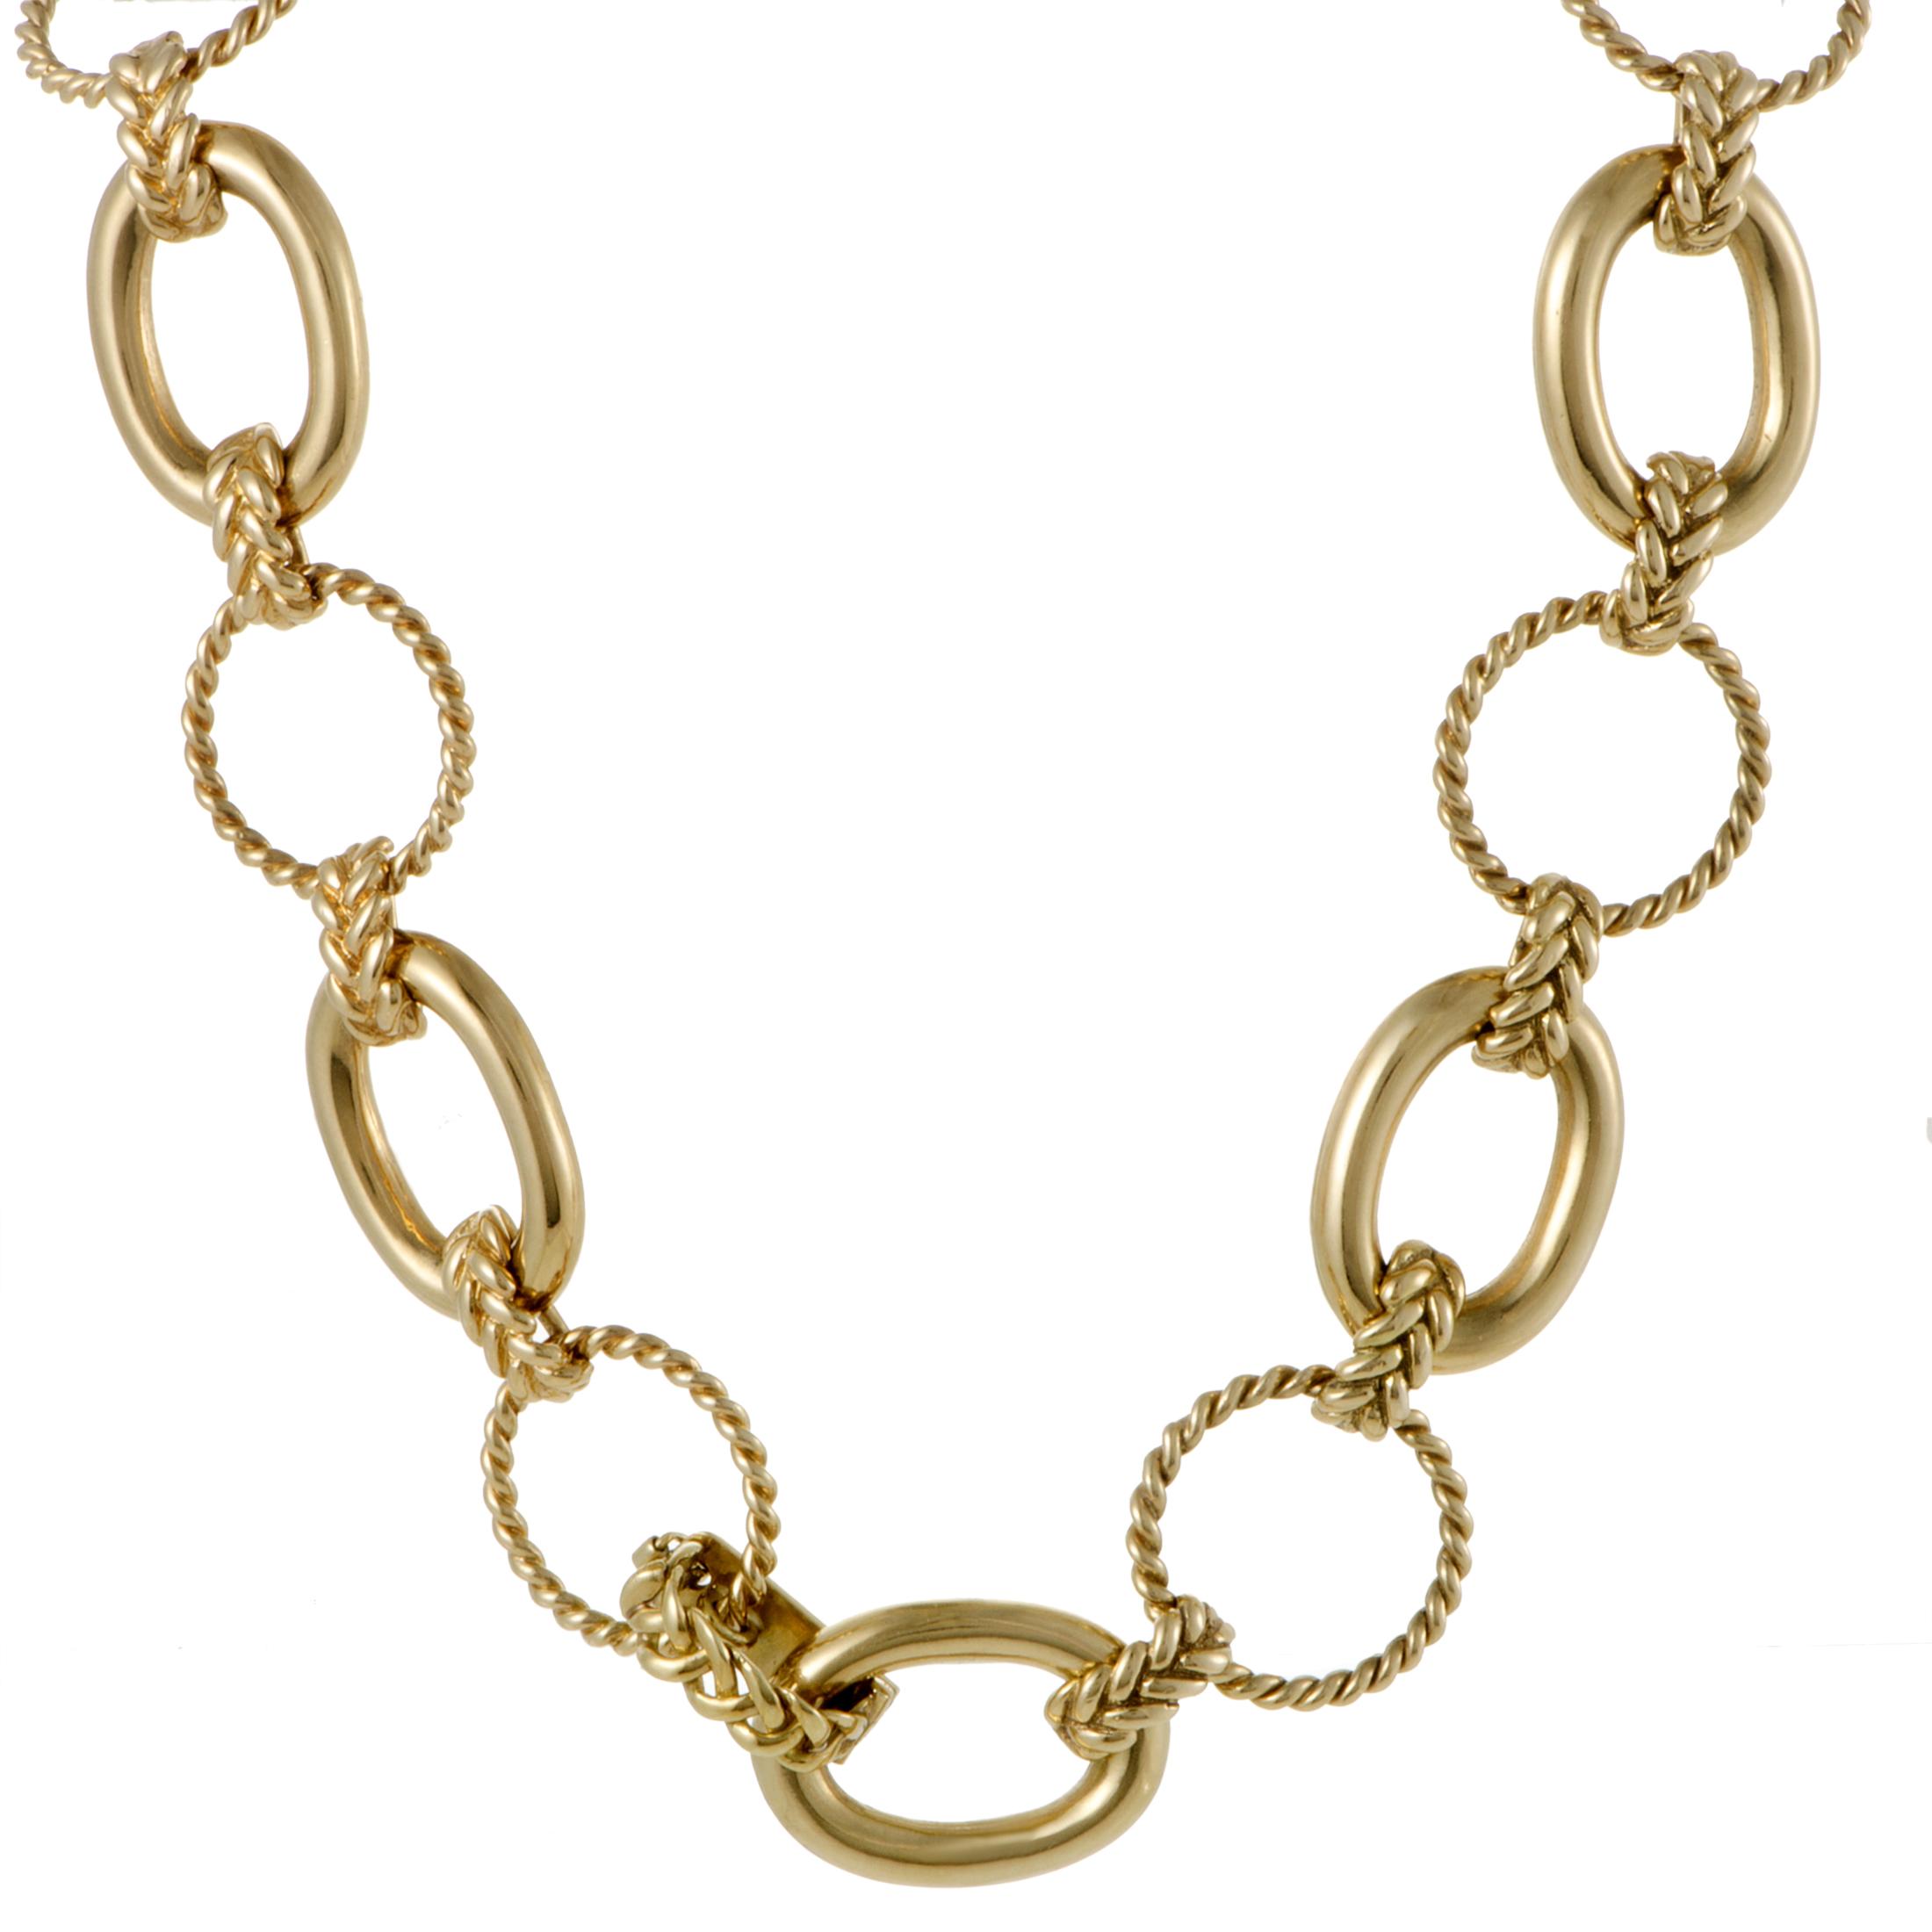 Carter Vintage Womens 18K Yellow Gold Large Link Neklace